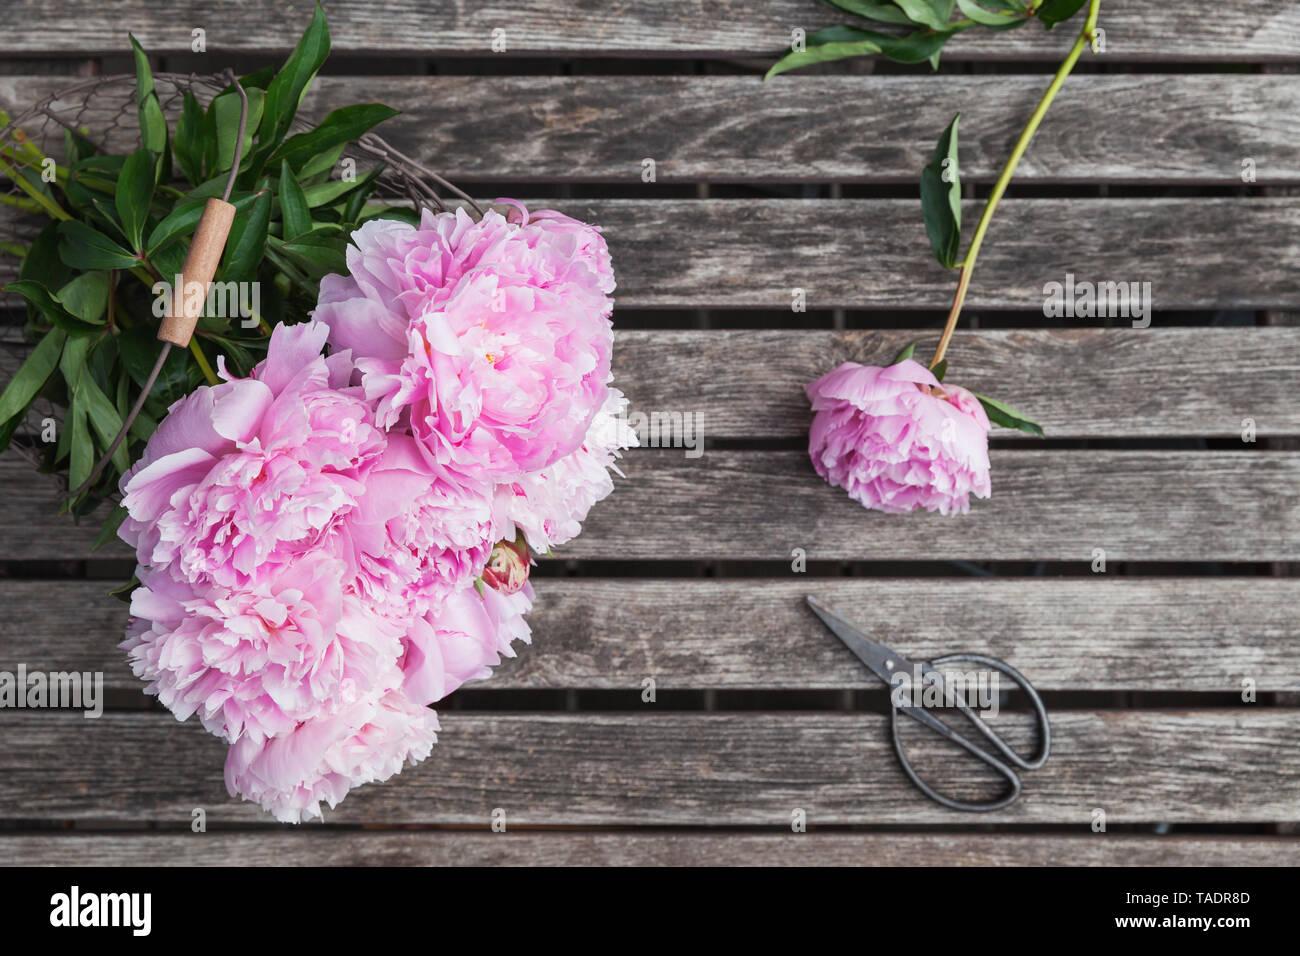 Peonies in basket on garden table with pruner - Stock Image